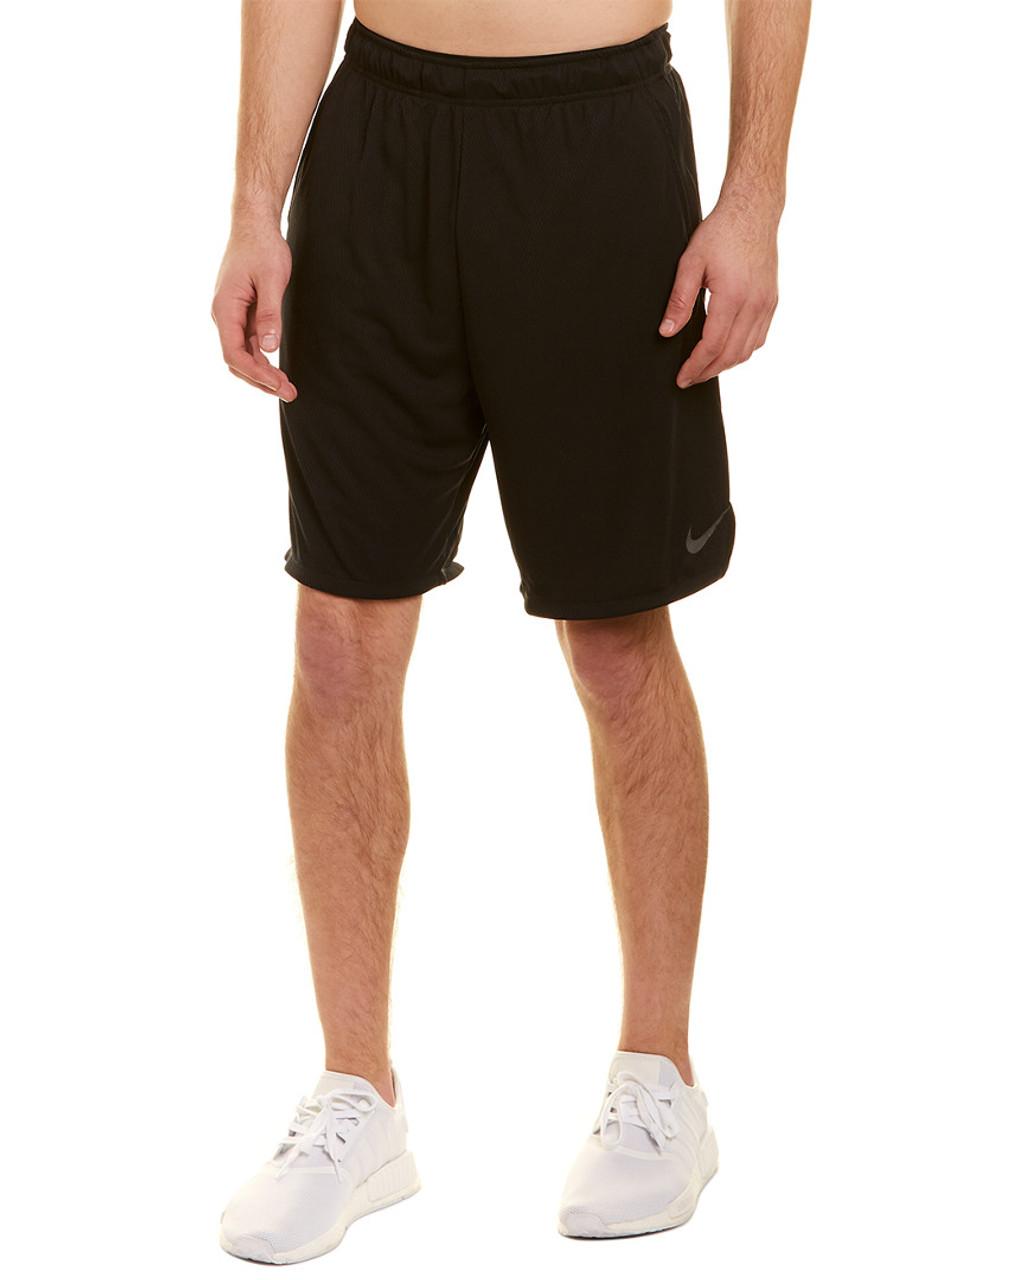 wholesale dealer 34ffd 146c1 Nike Dry Short 4.0